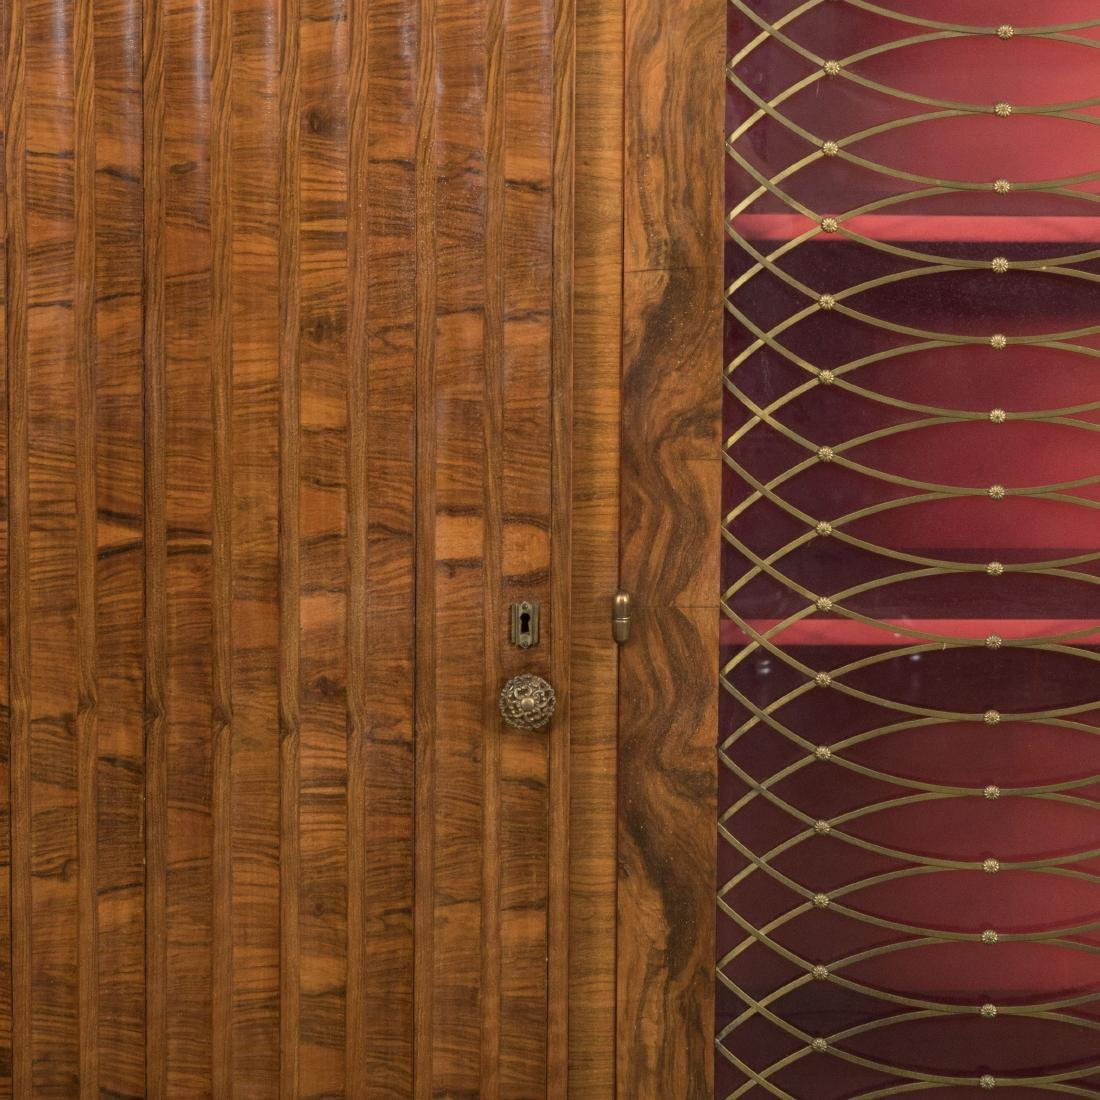 Burled English Art Deco Armoire - Epstein Brothers - 2